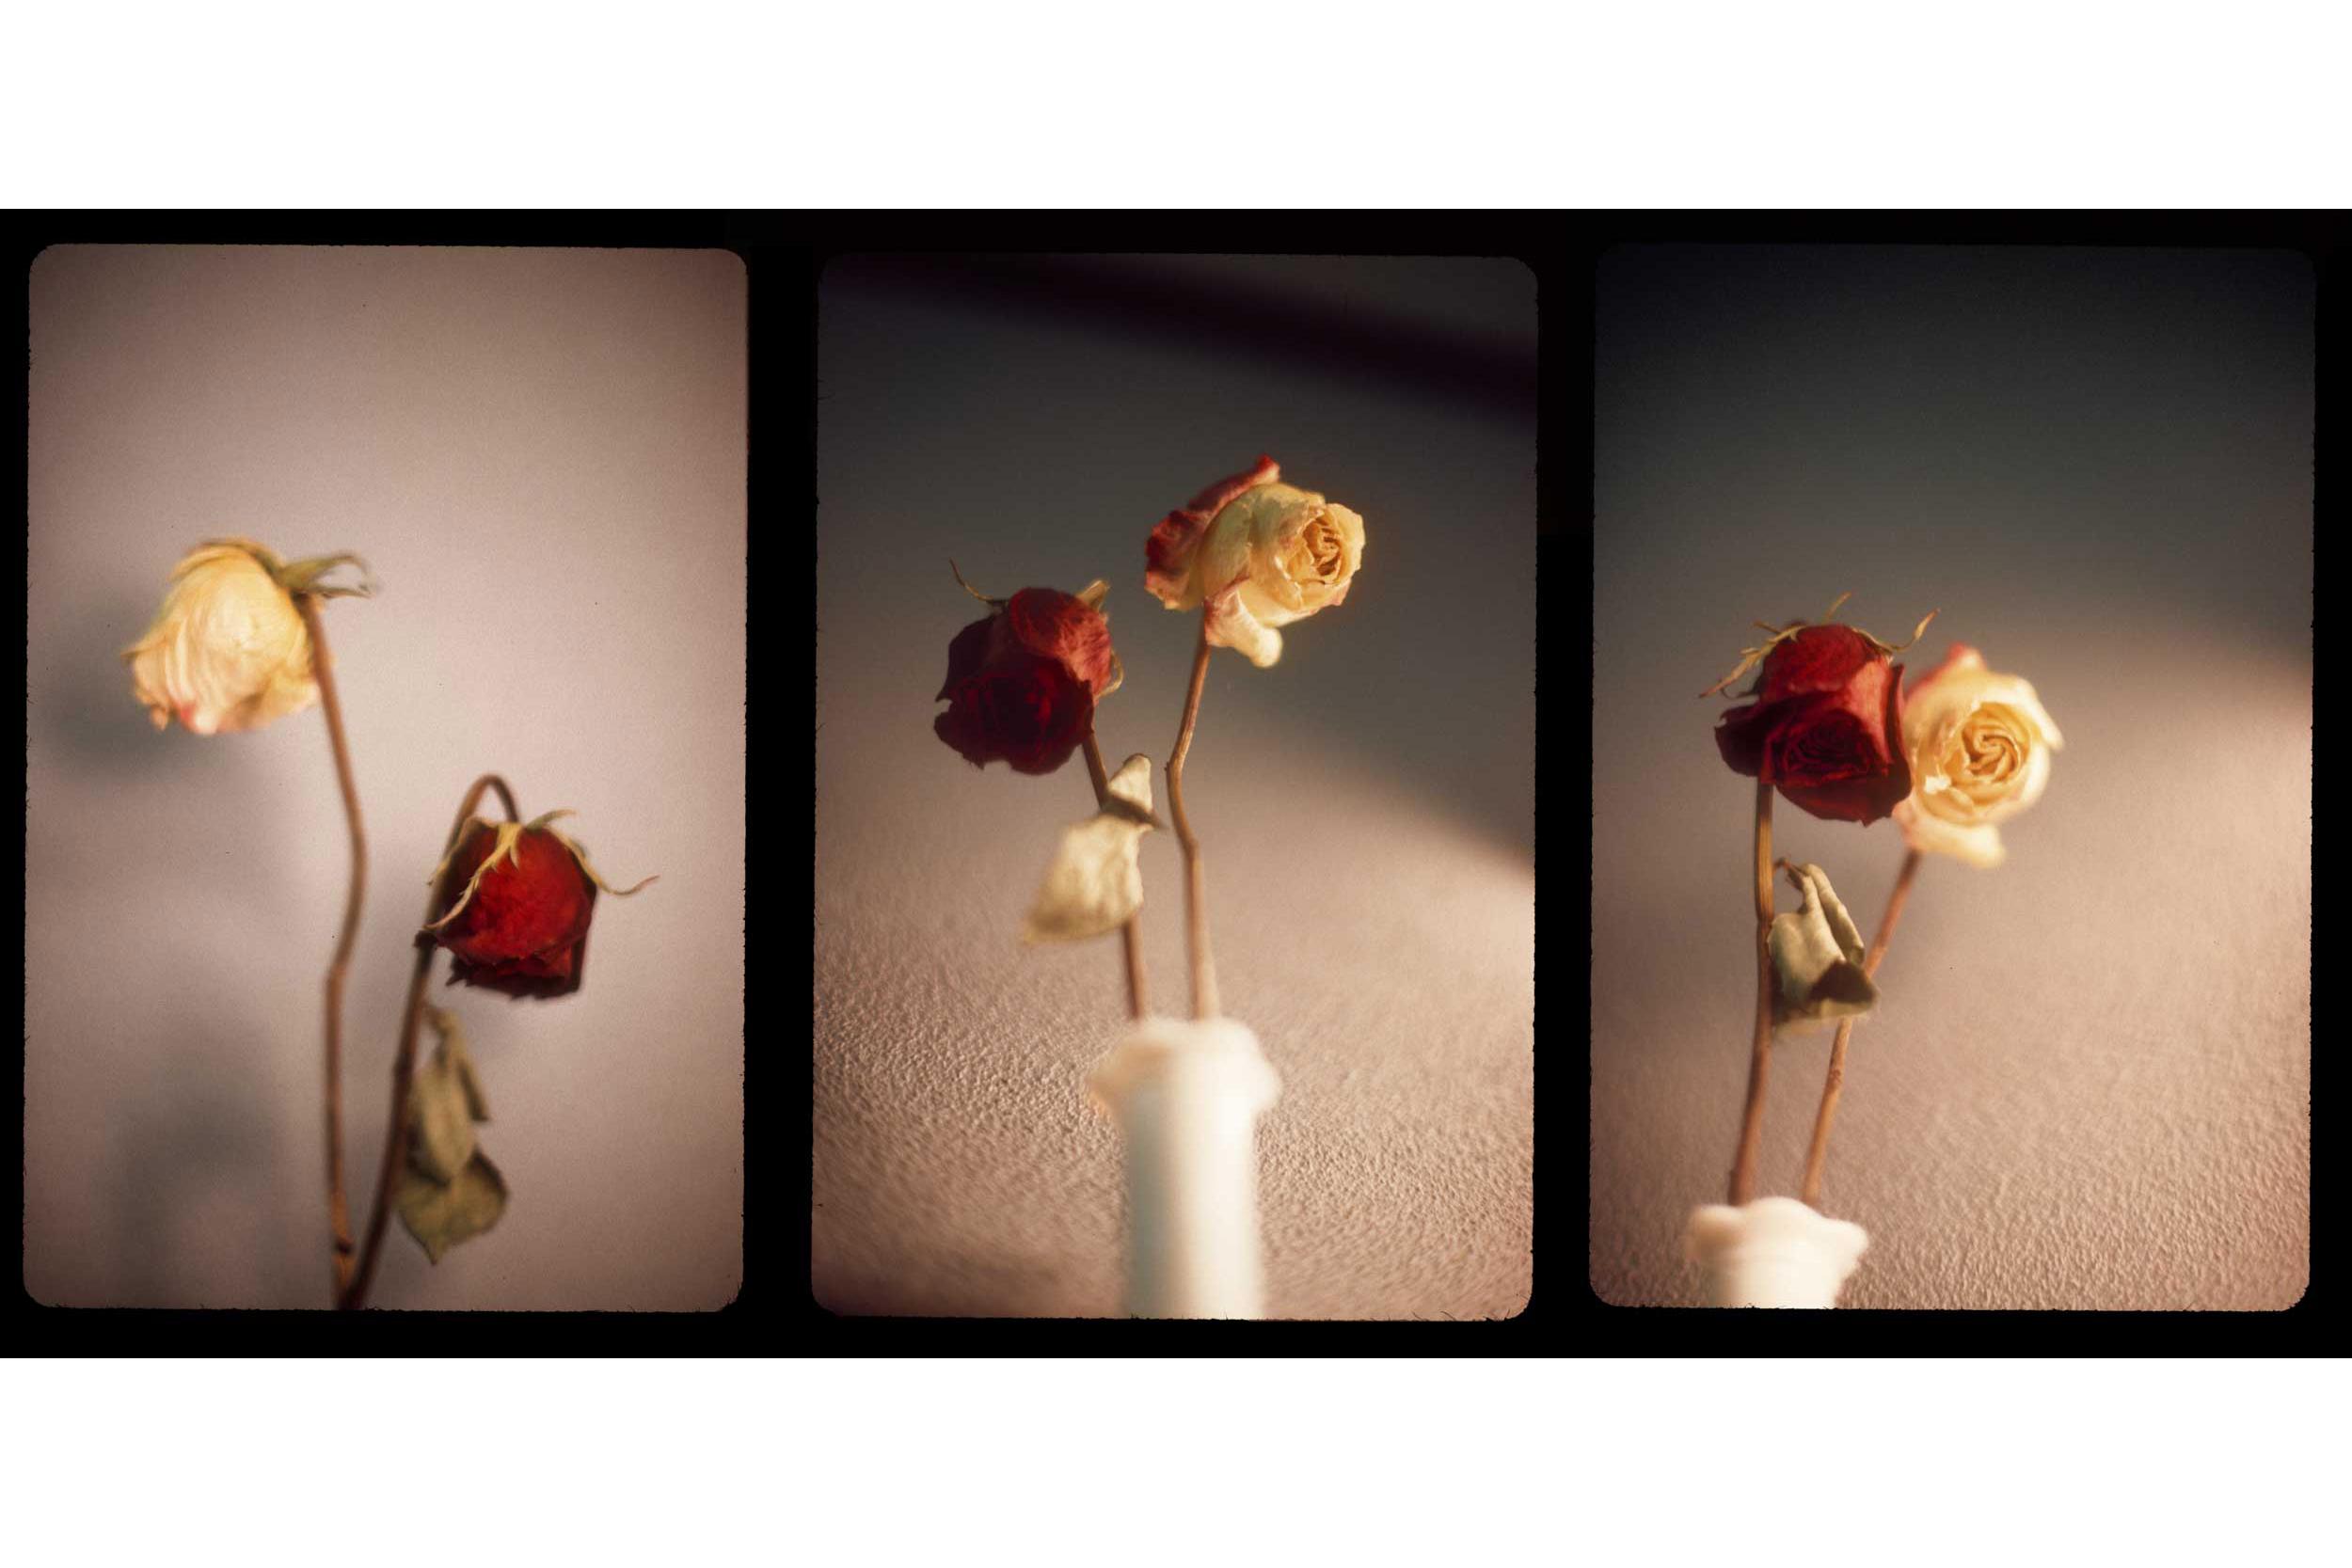 <br><br><br>Triptych in Kodachrome